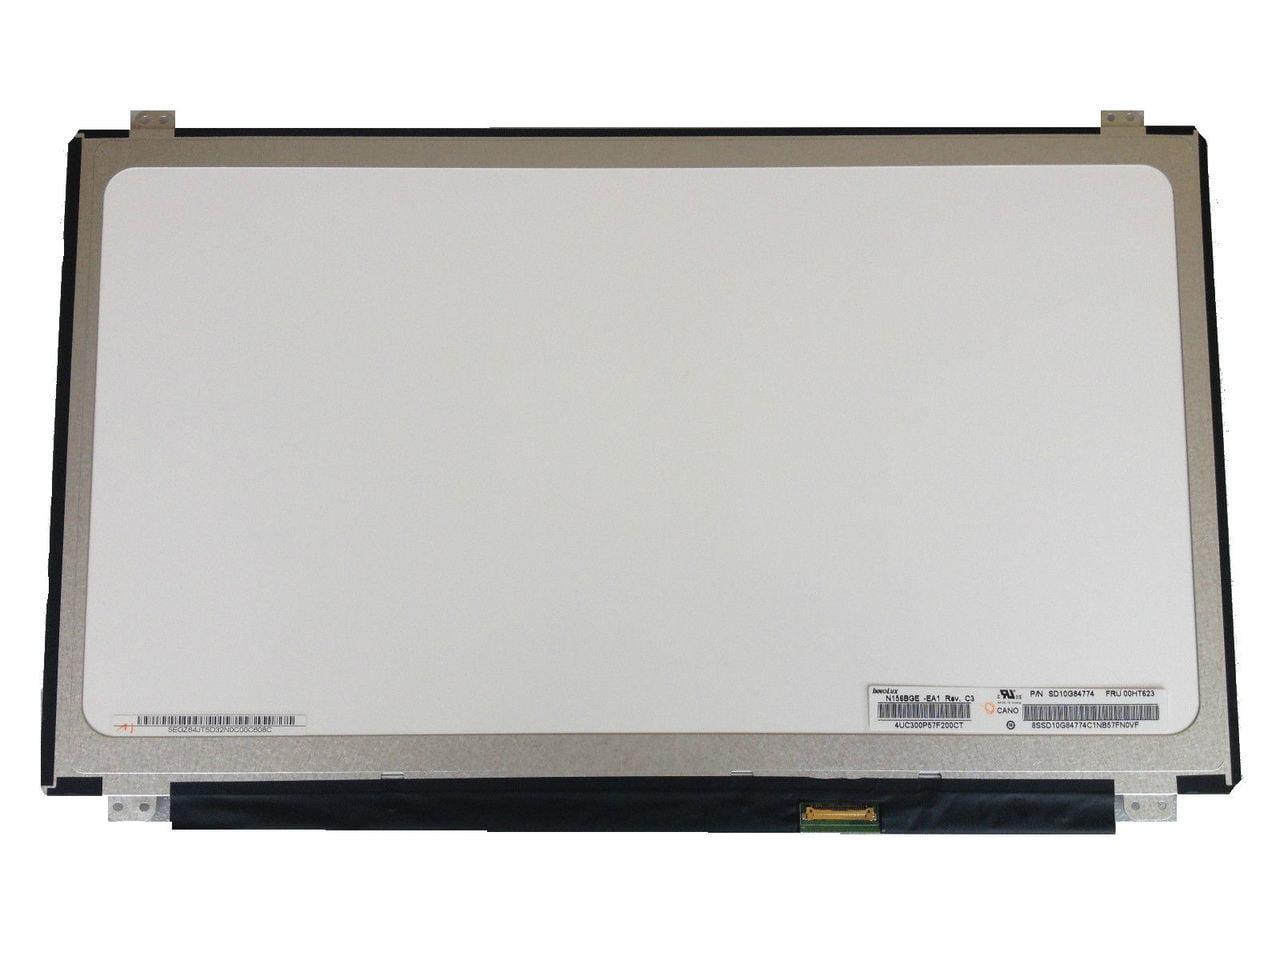 "Laptop LCD LED Screen FOR LENOVO EDGE 2-1580 15.6/"" Full-HD 1080P Non-Touch"